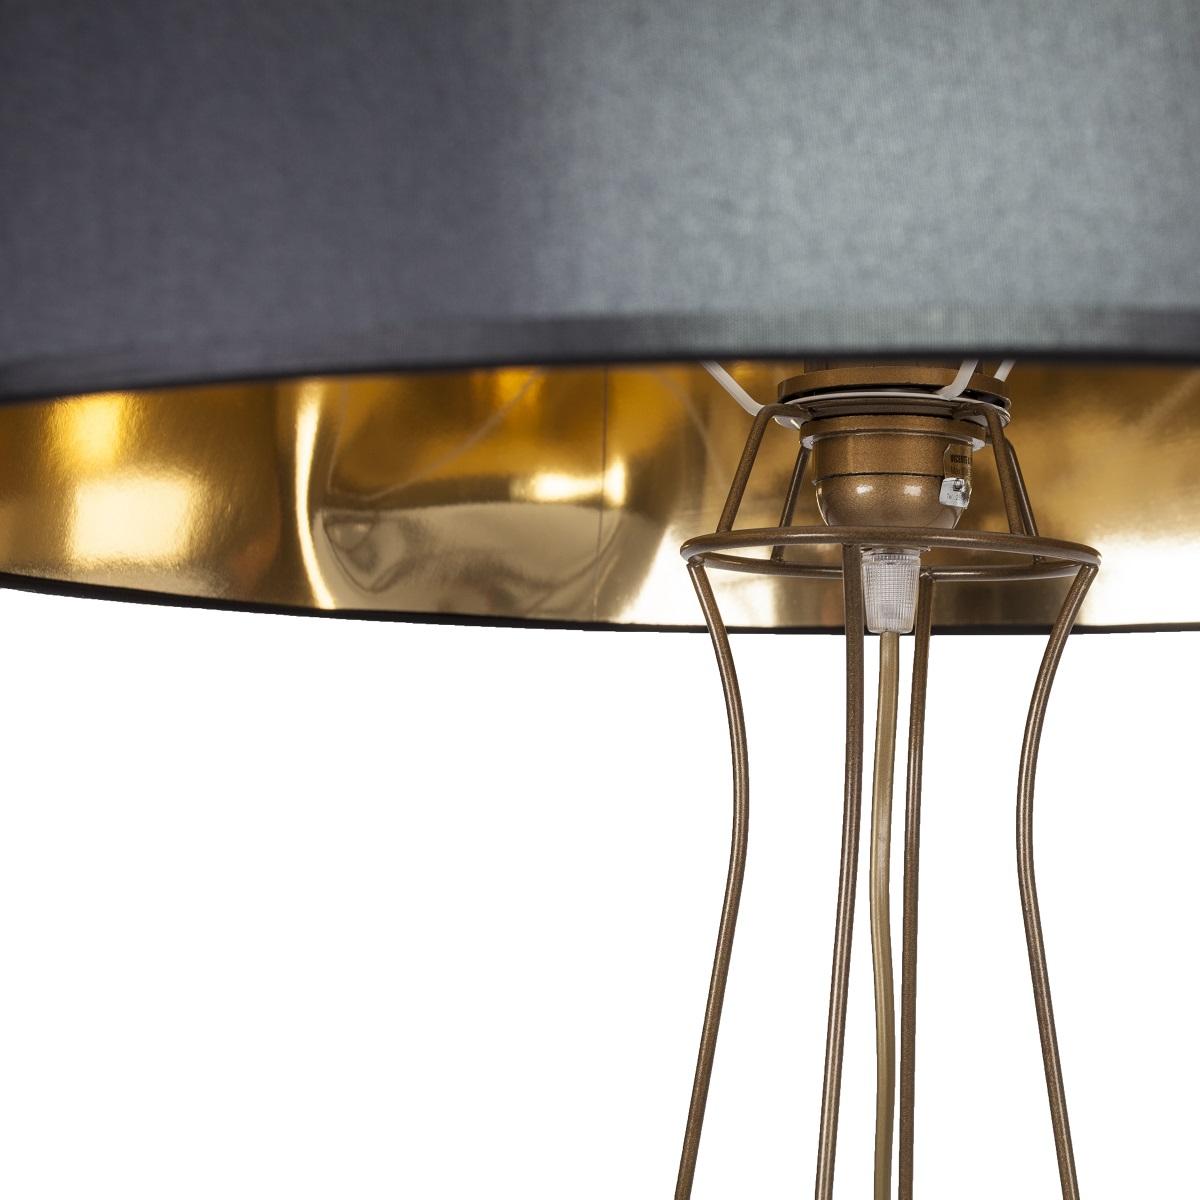 lampenhelden vandeheg stehleuchte petticoat metall leinen schwarz gold 50xh135cm. Black Bedroom Furniture Sets. Home Design Ideas